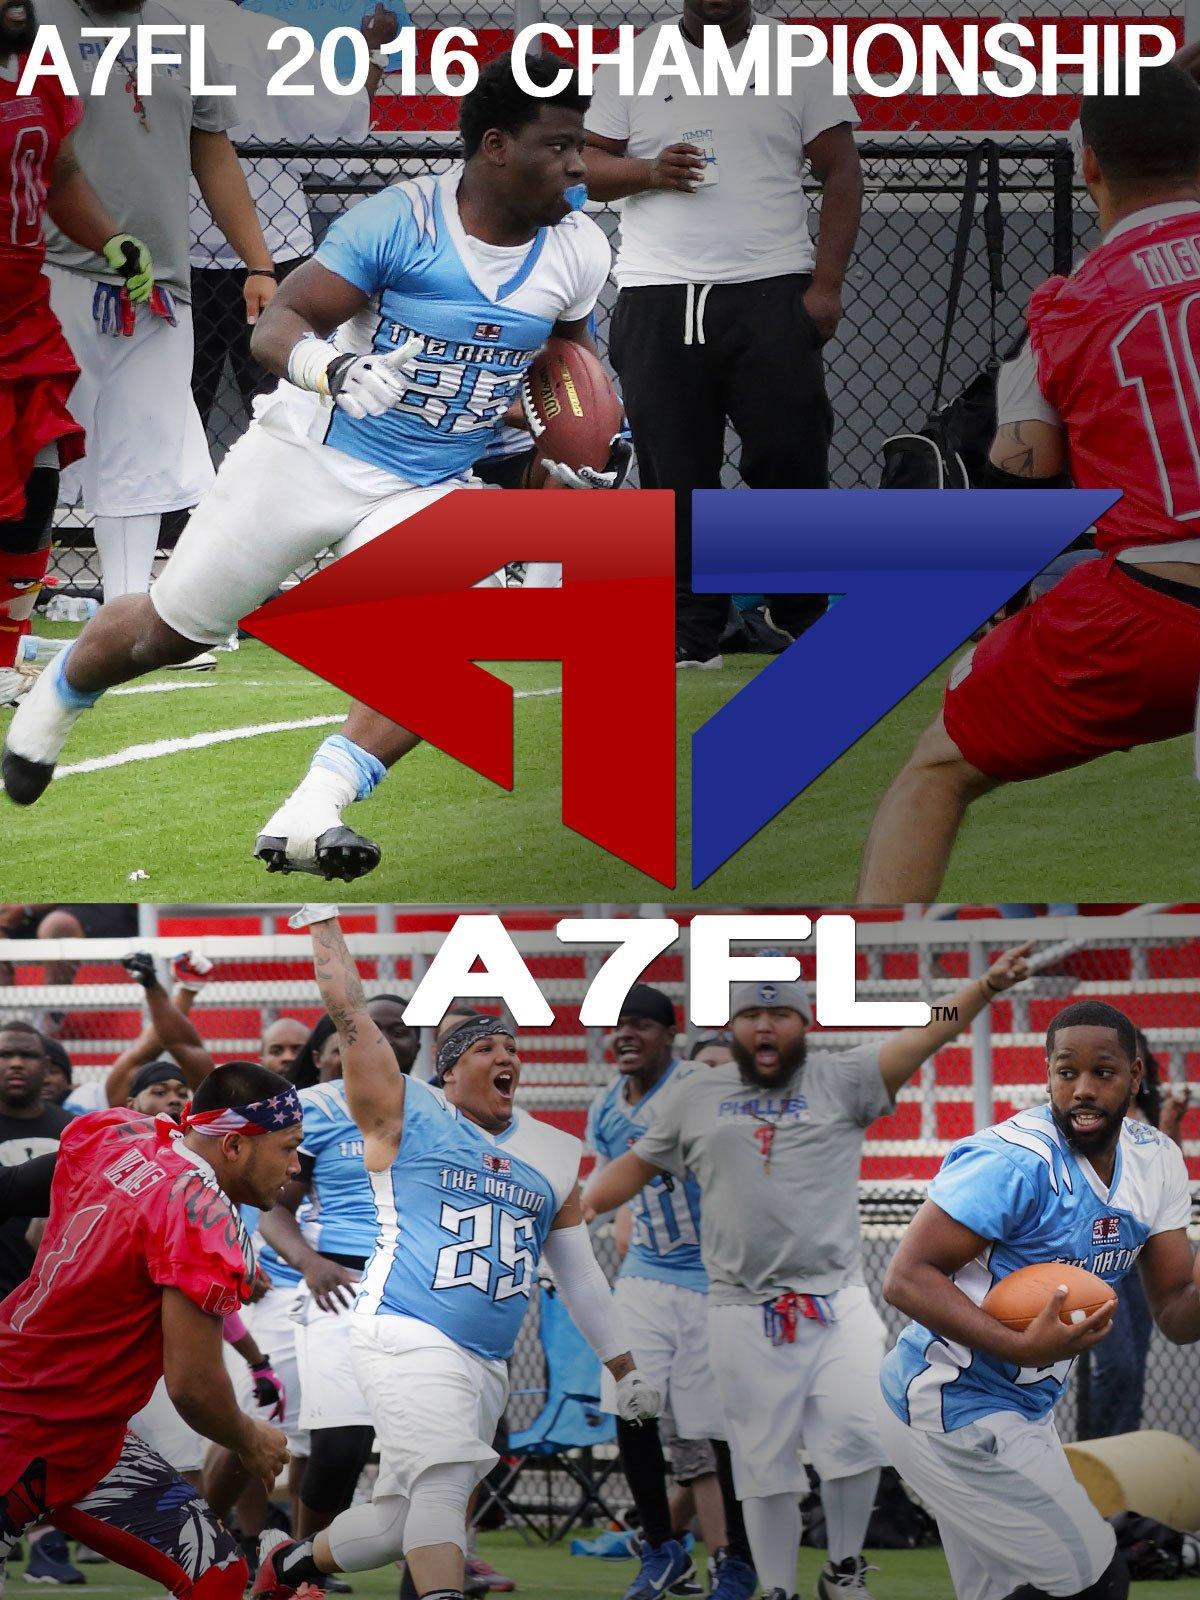 2016 A7FL Championship